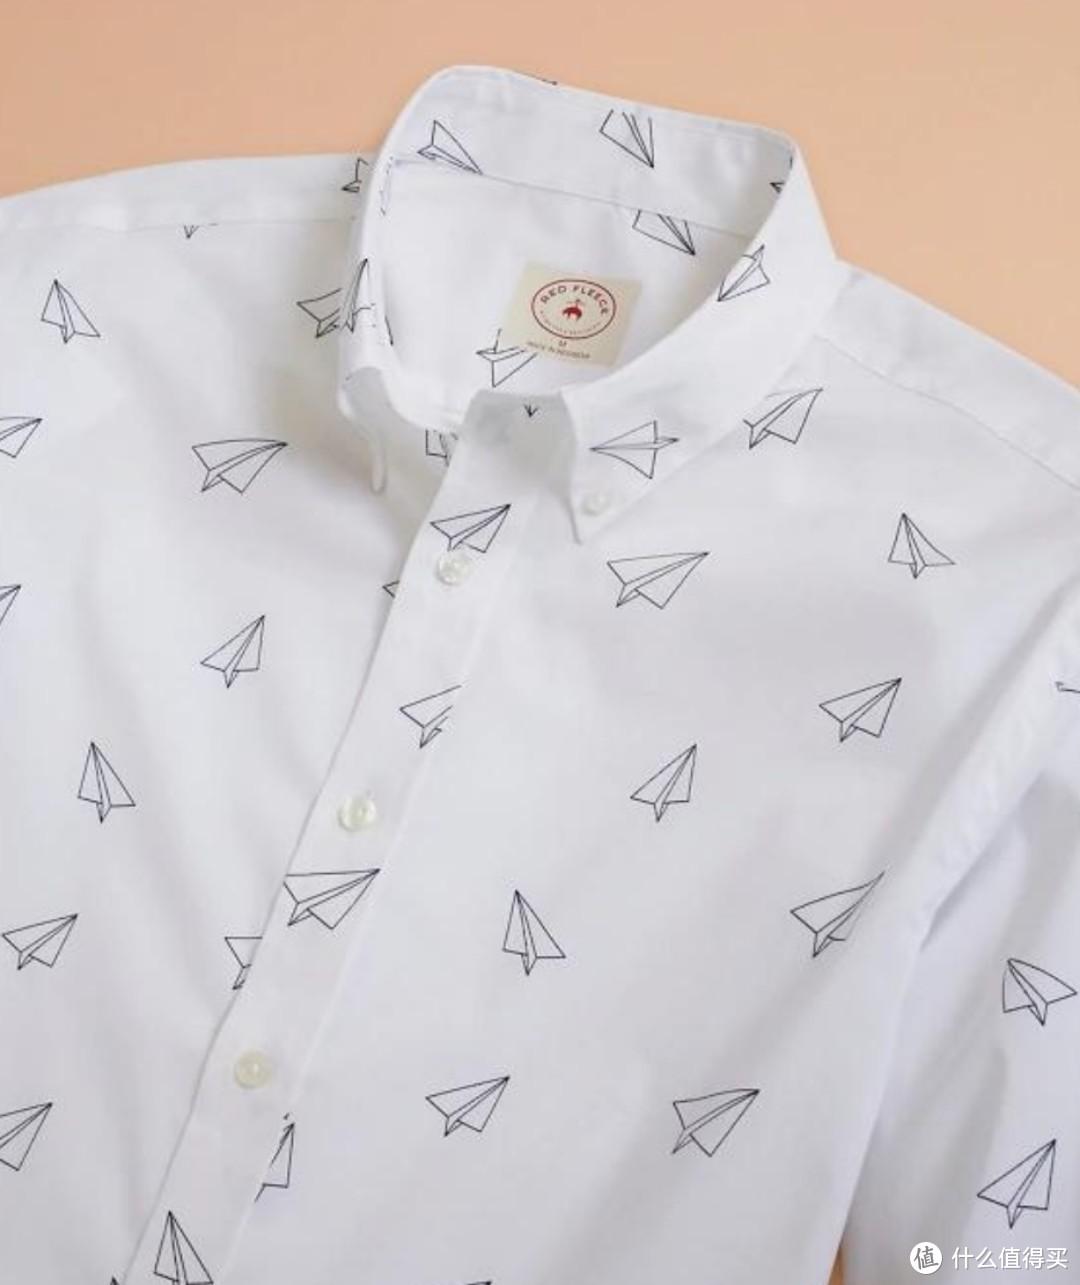 Brooks Brothers布克兄弟衬衫3折!美国总统御用商务男装!